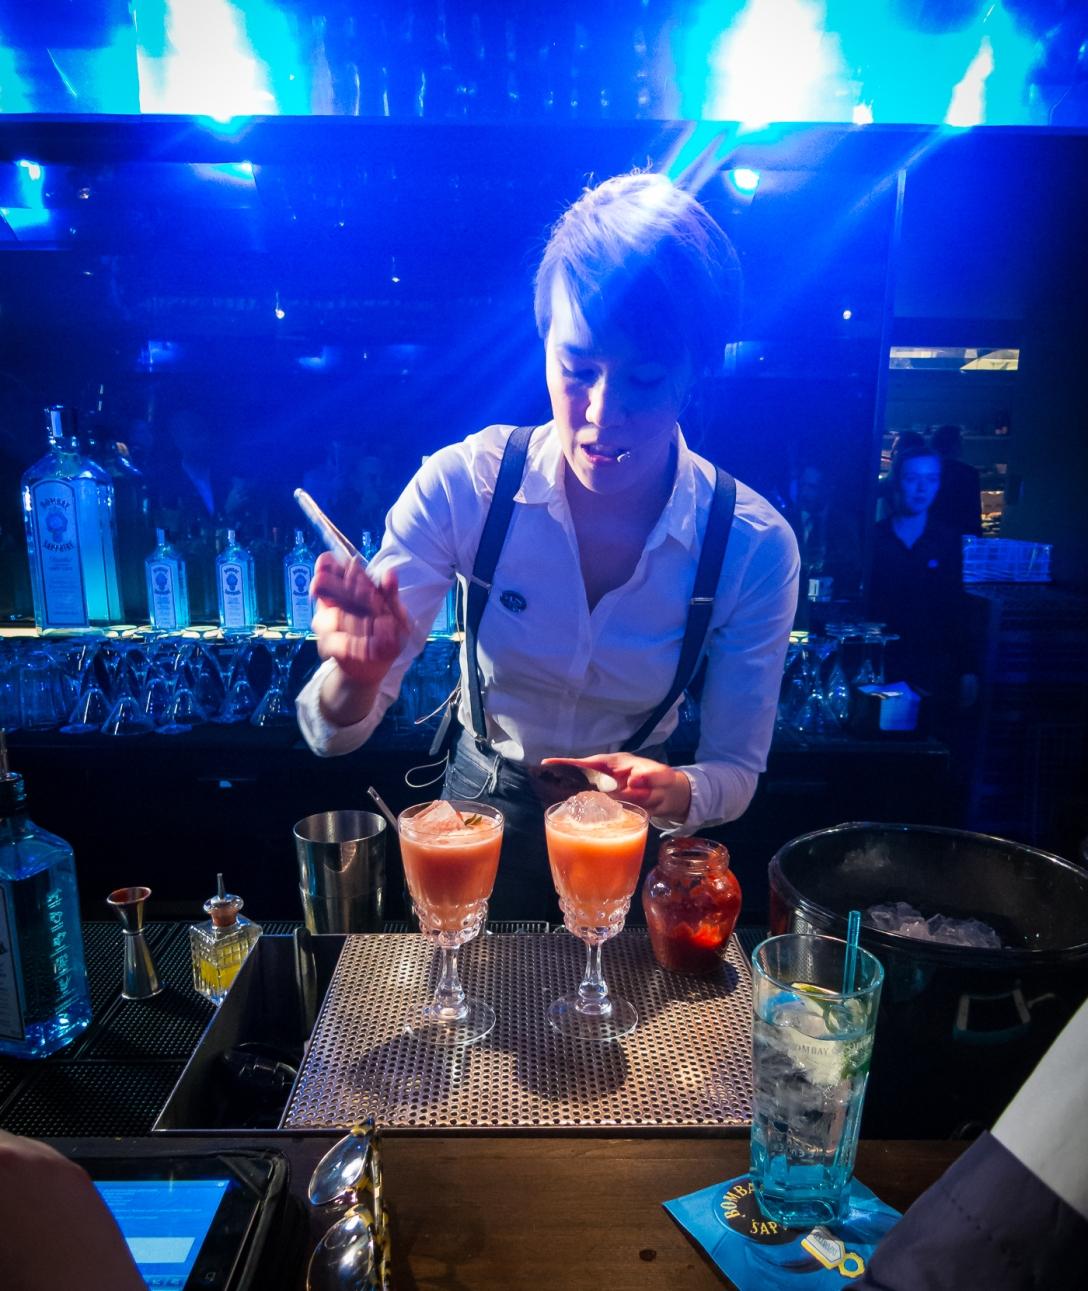 Angelina June Brandt Fugl med sin cocktail Beautiful Mess. Photo: Michael Sperling